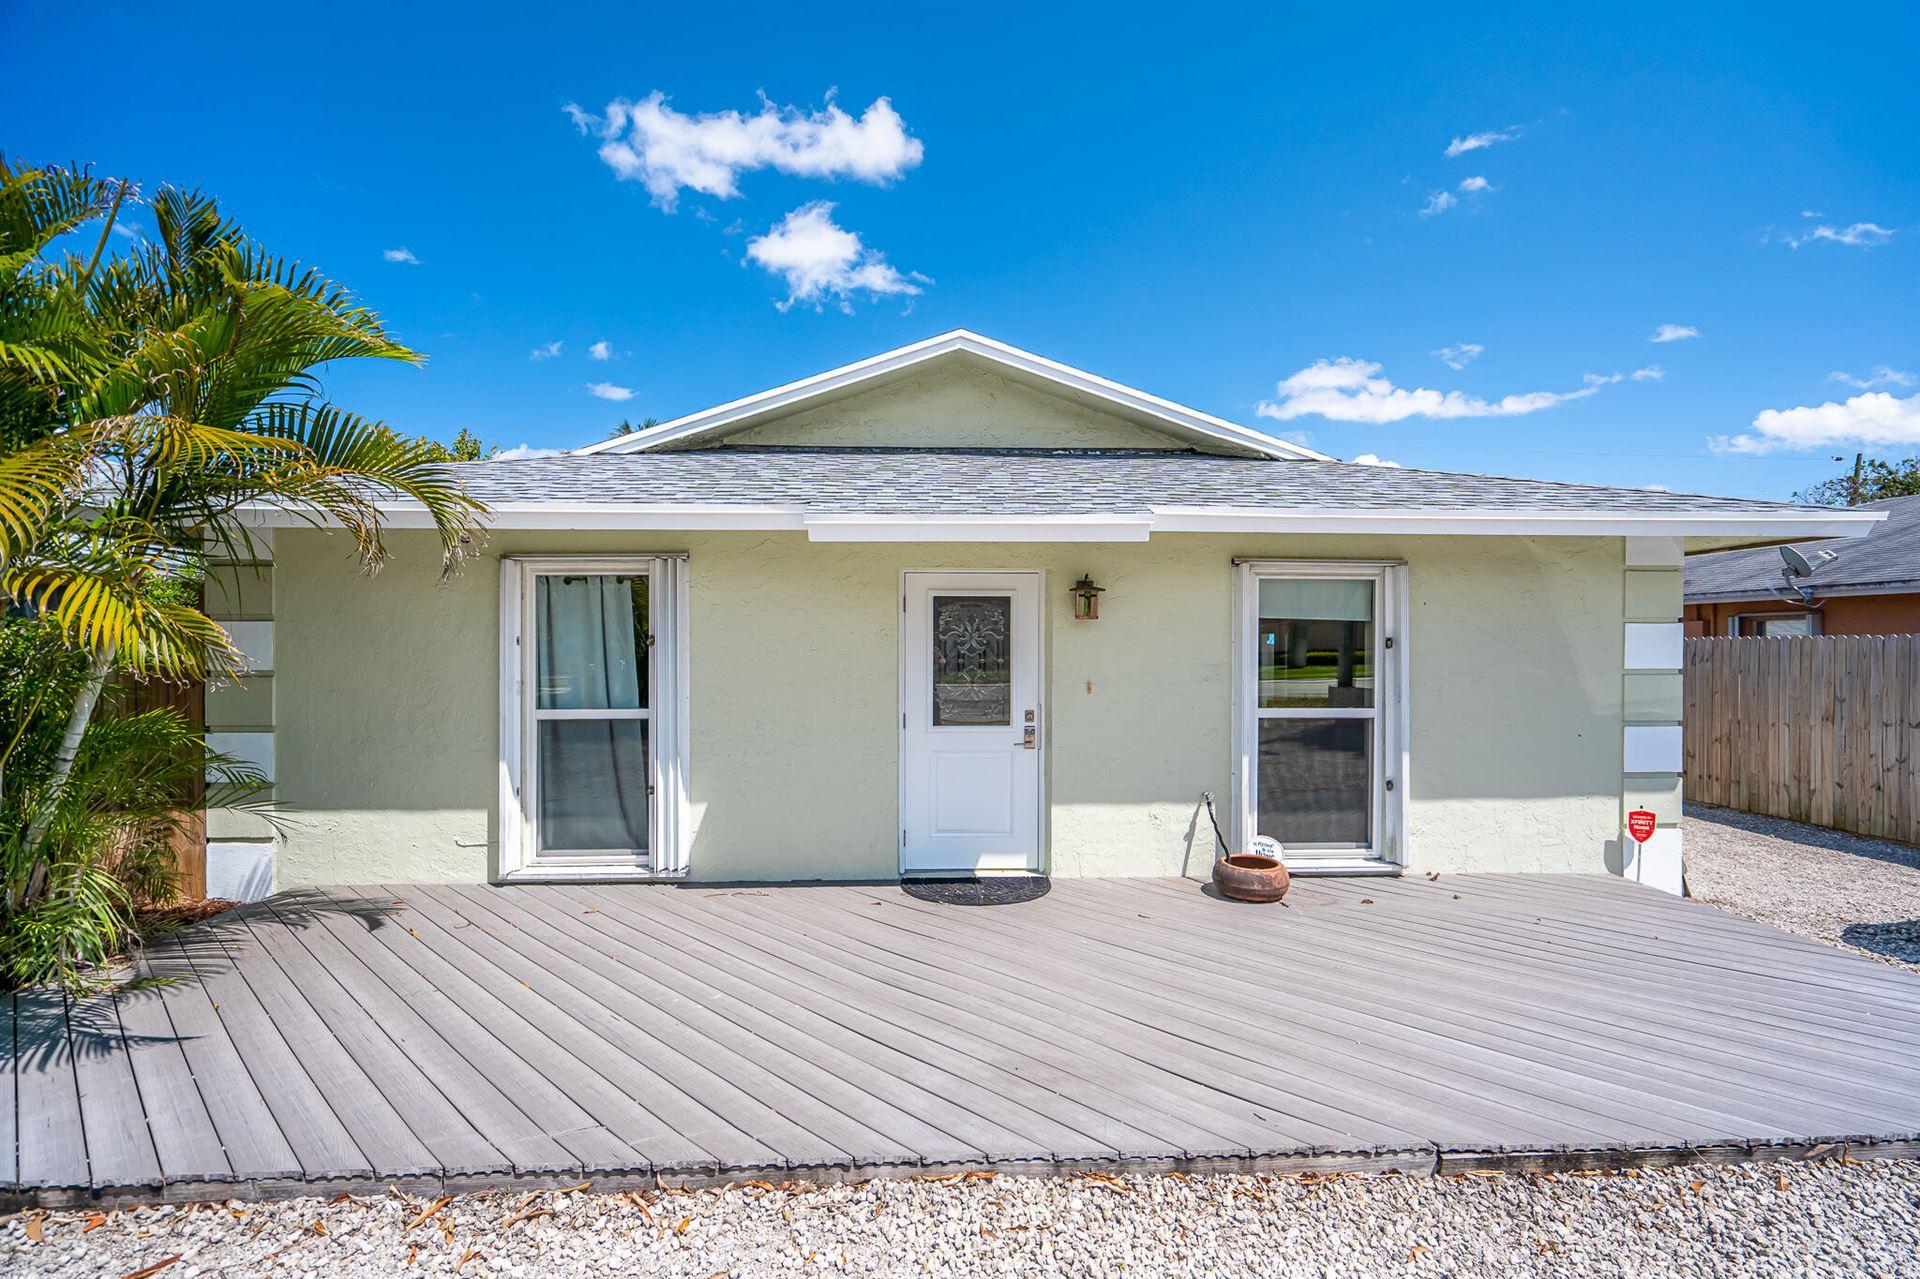 3298 N Dixie Hwy Highway, Boca Raton, FL 33431 - #: RX-10705881